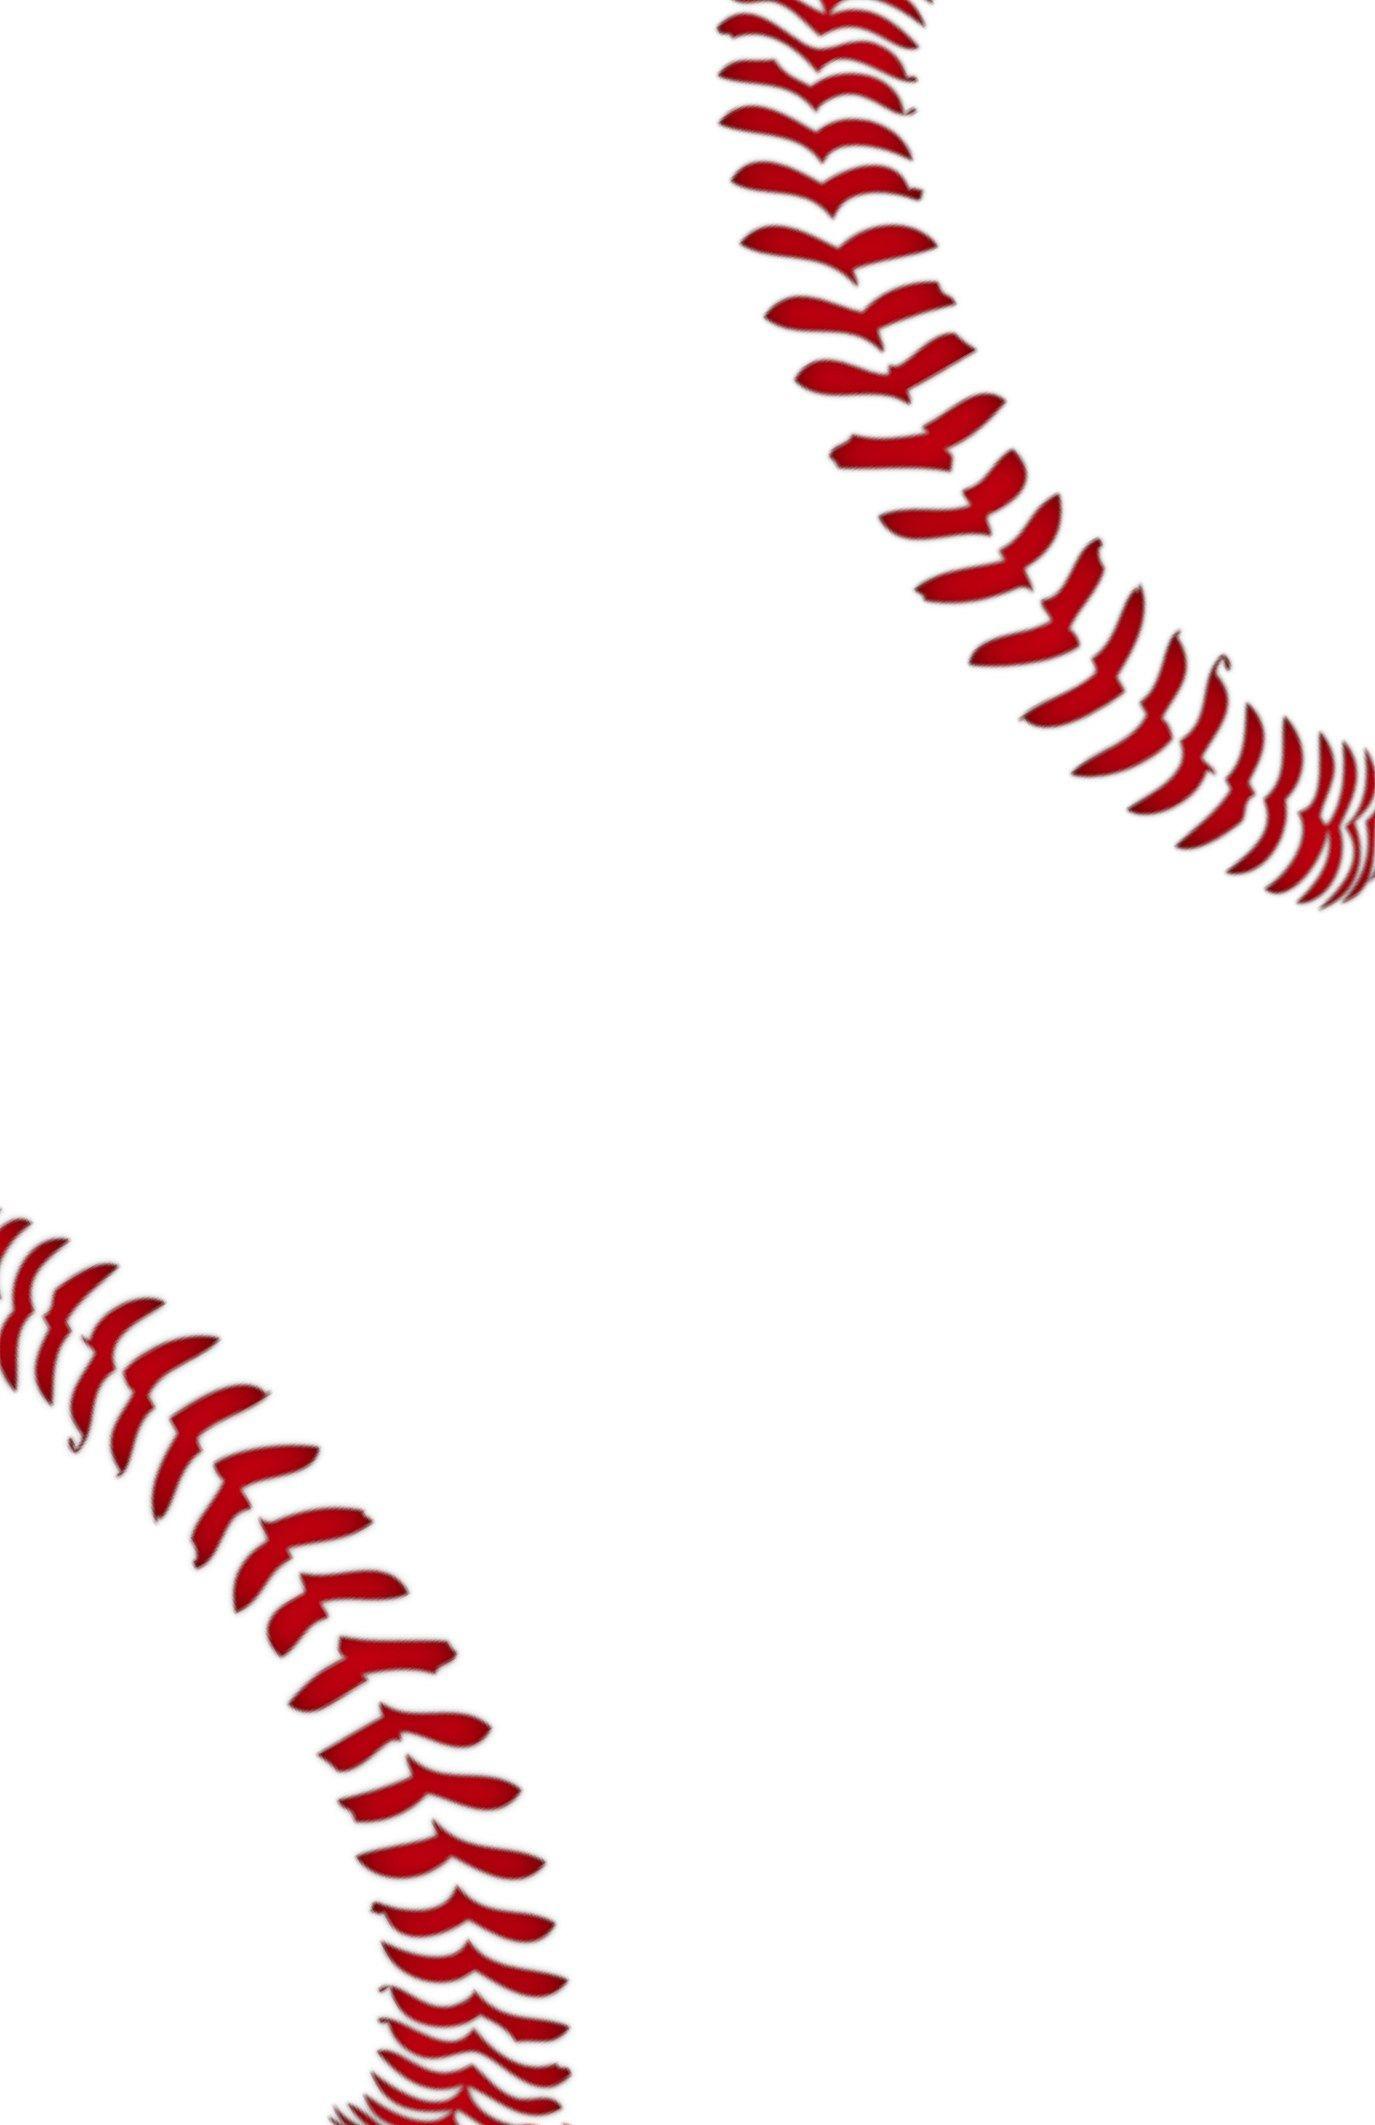 Baseball Party Invitations Free Printable | Party Ideas | Baseball - Free Printable Baseball Stationery